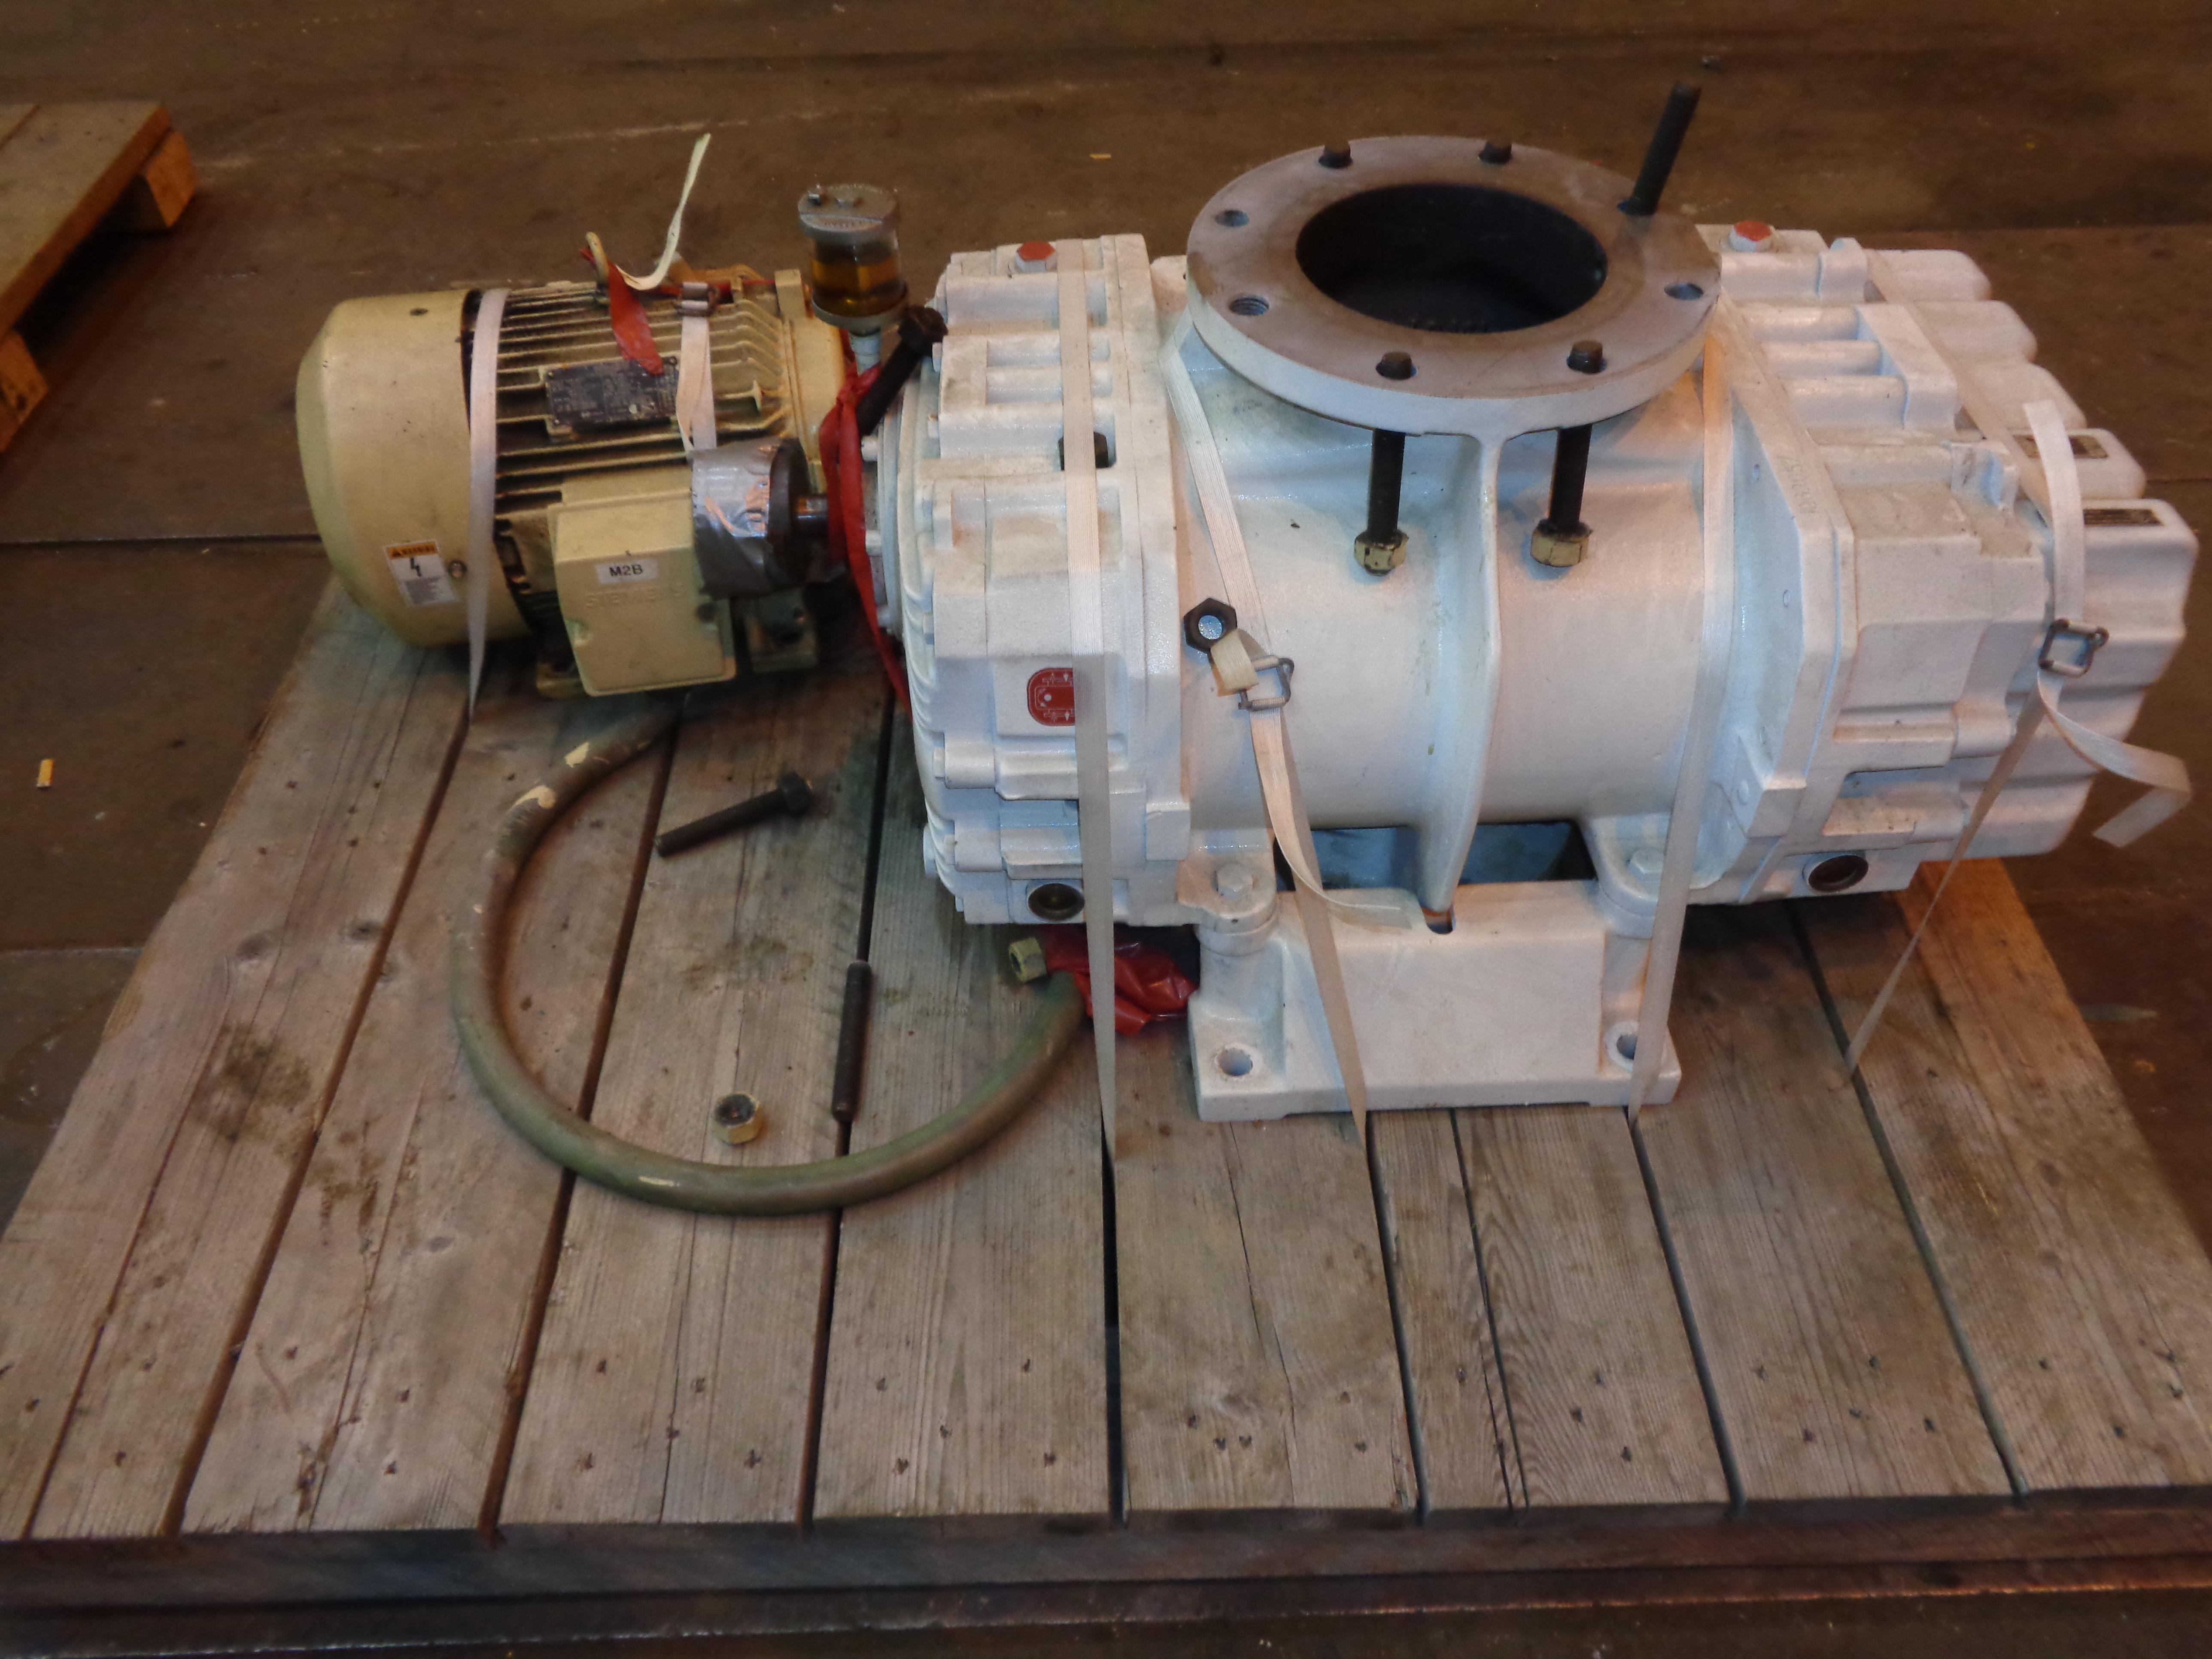 Lot of 3 Vacuum Pumps - Image 18 of 26